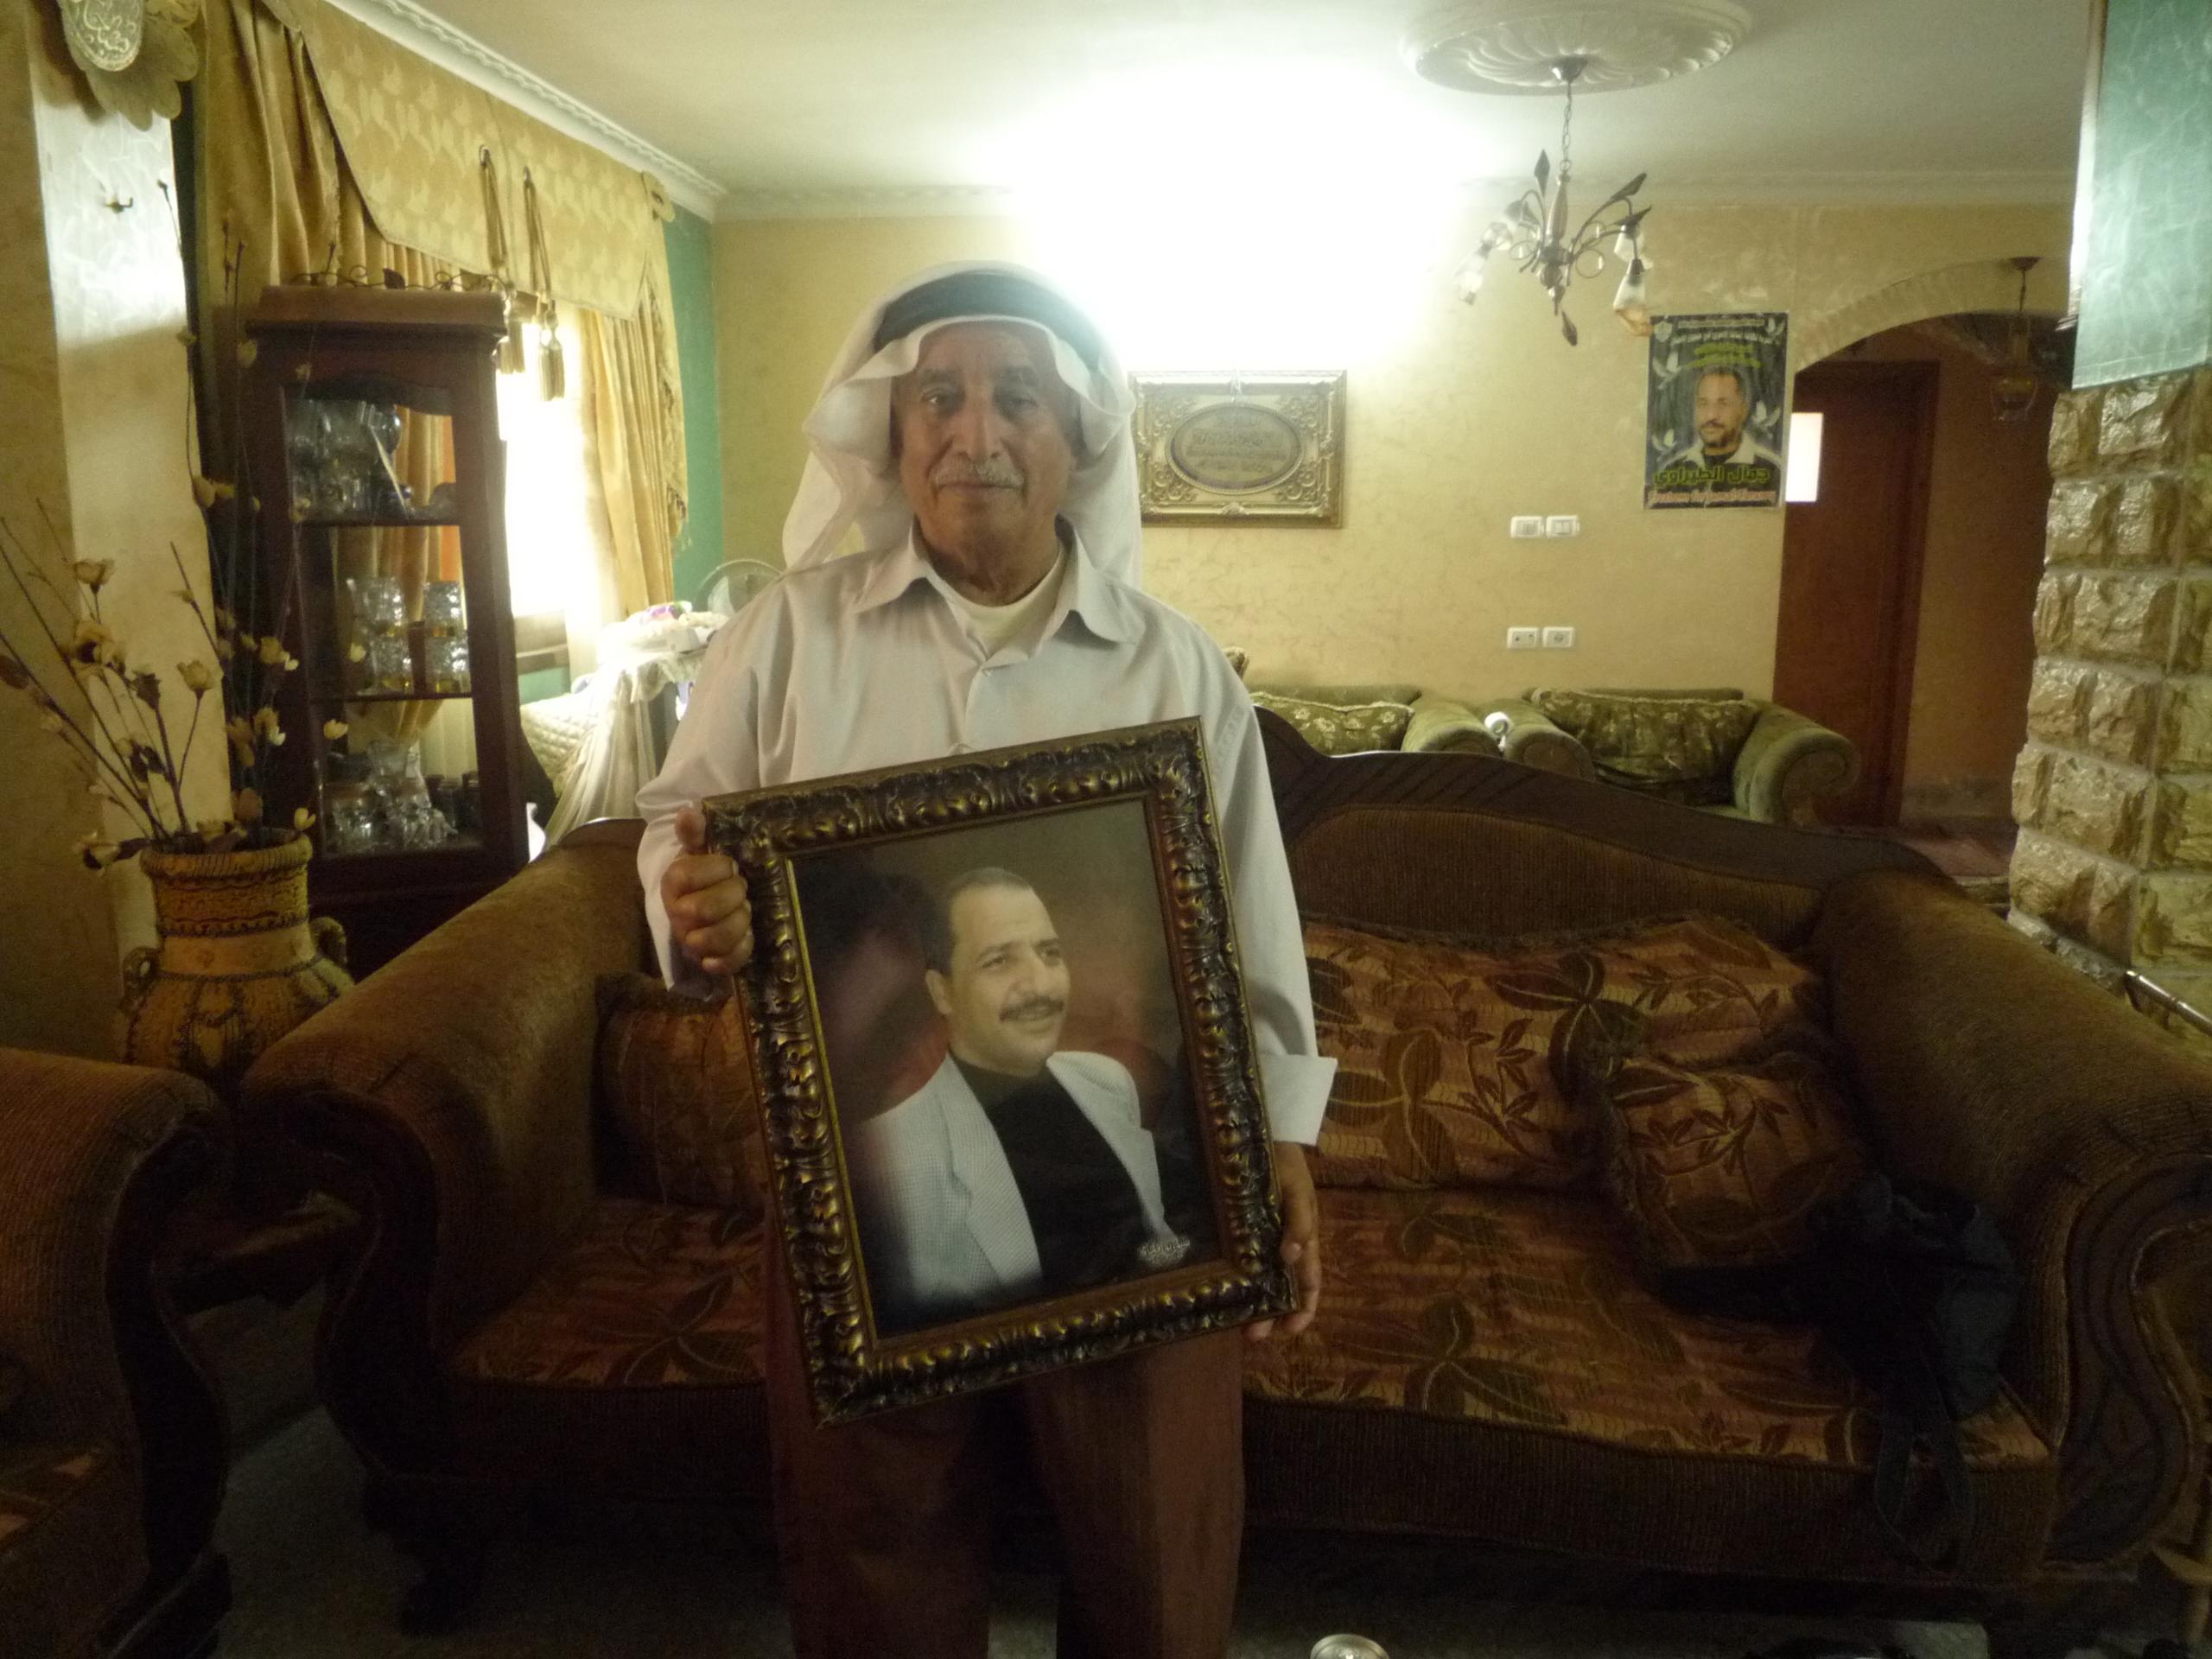 Abdul Amid dans sa maison à Naplouse, Cisjordanie. Mai 2013 www.merblanche.com all rights reserved